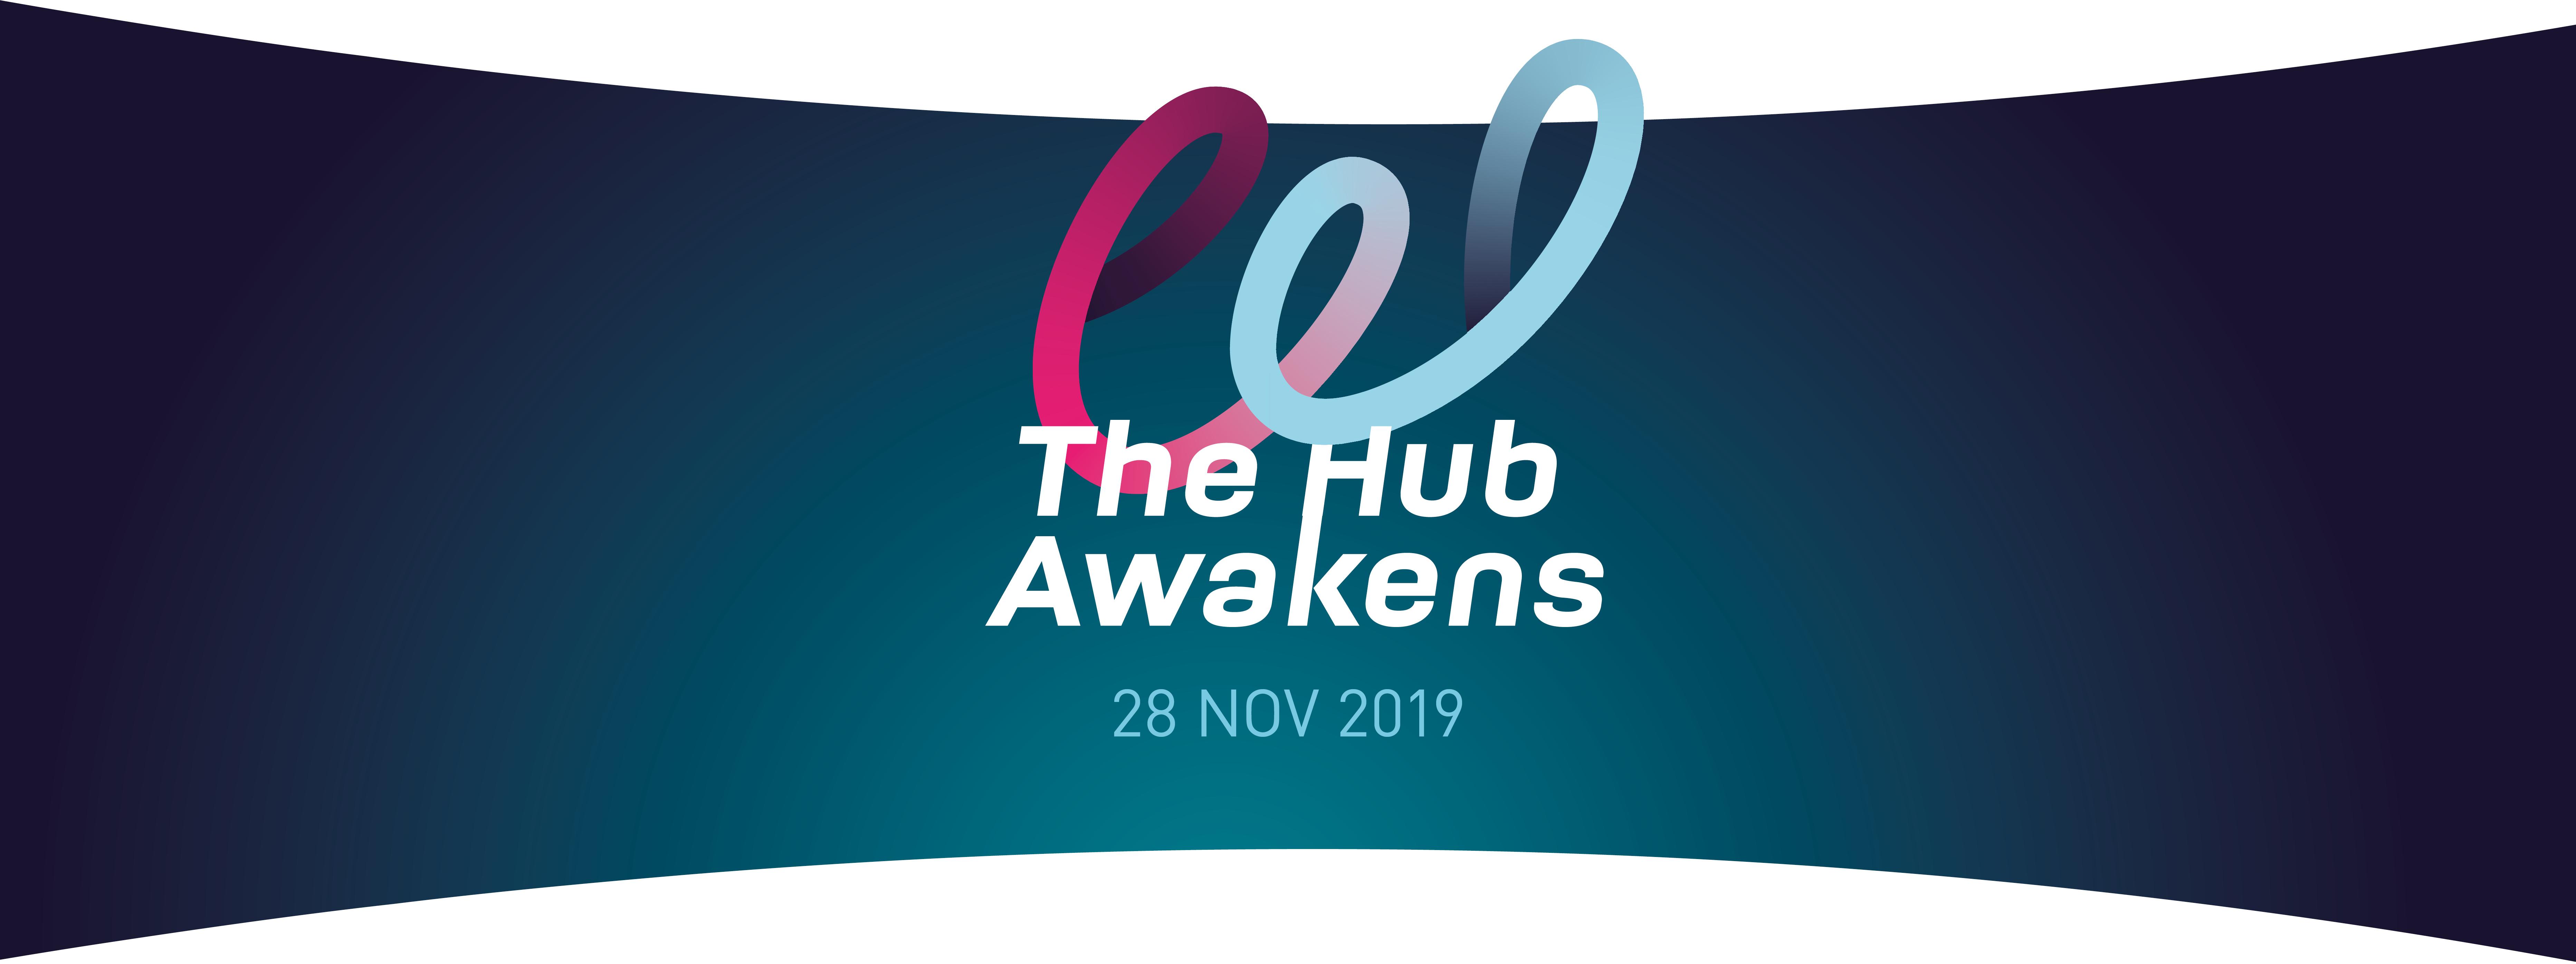 The Hub Awakens